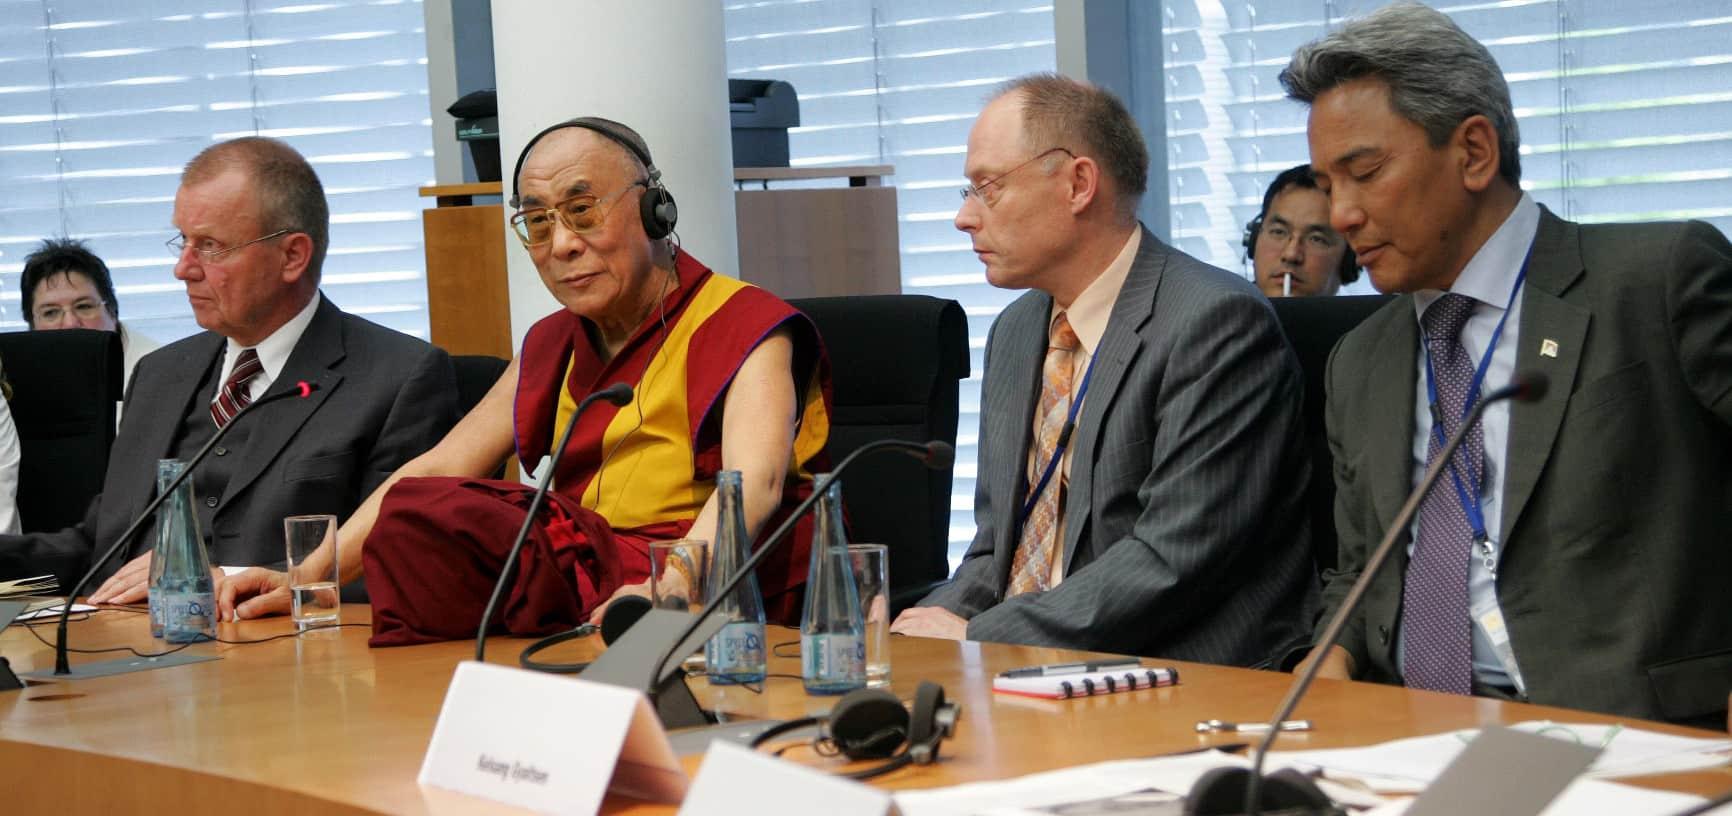 Dalai Lama Ausschuss 2008_(c) Guido Frebel